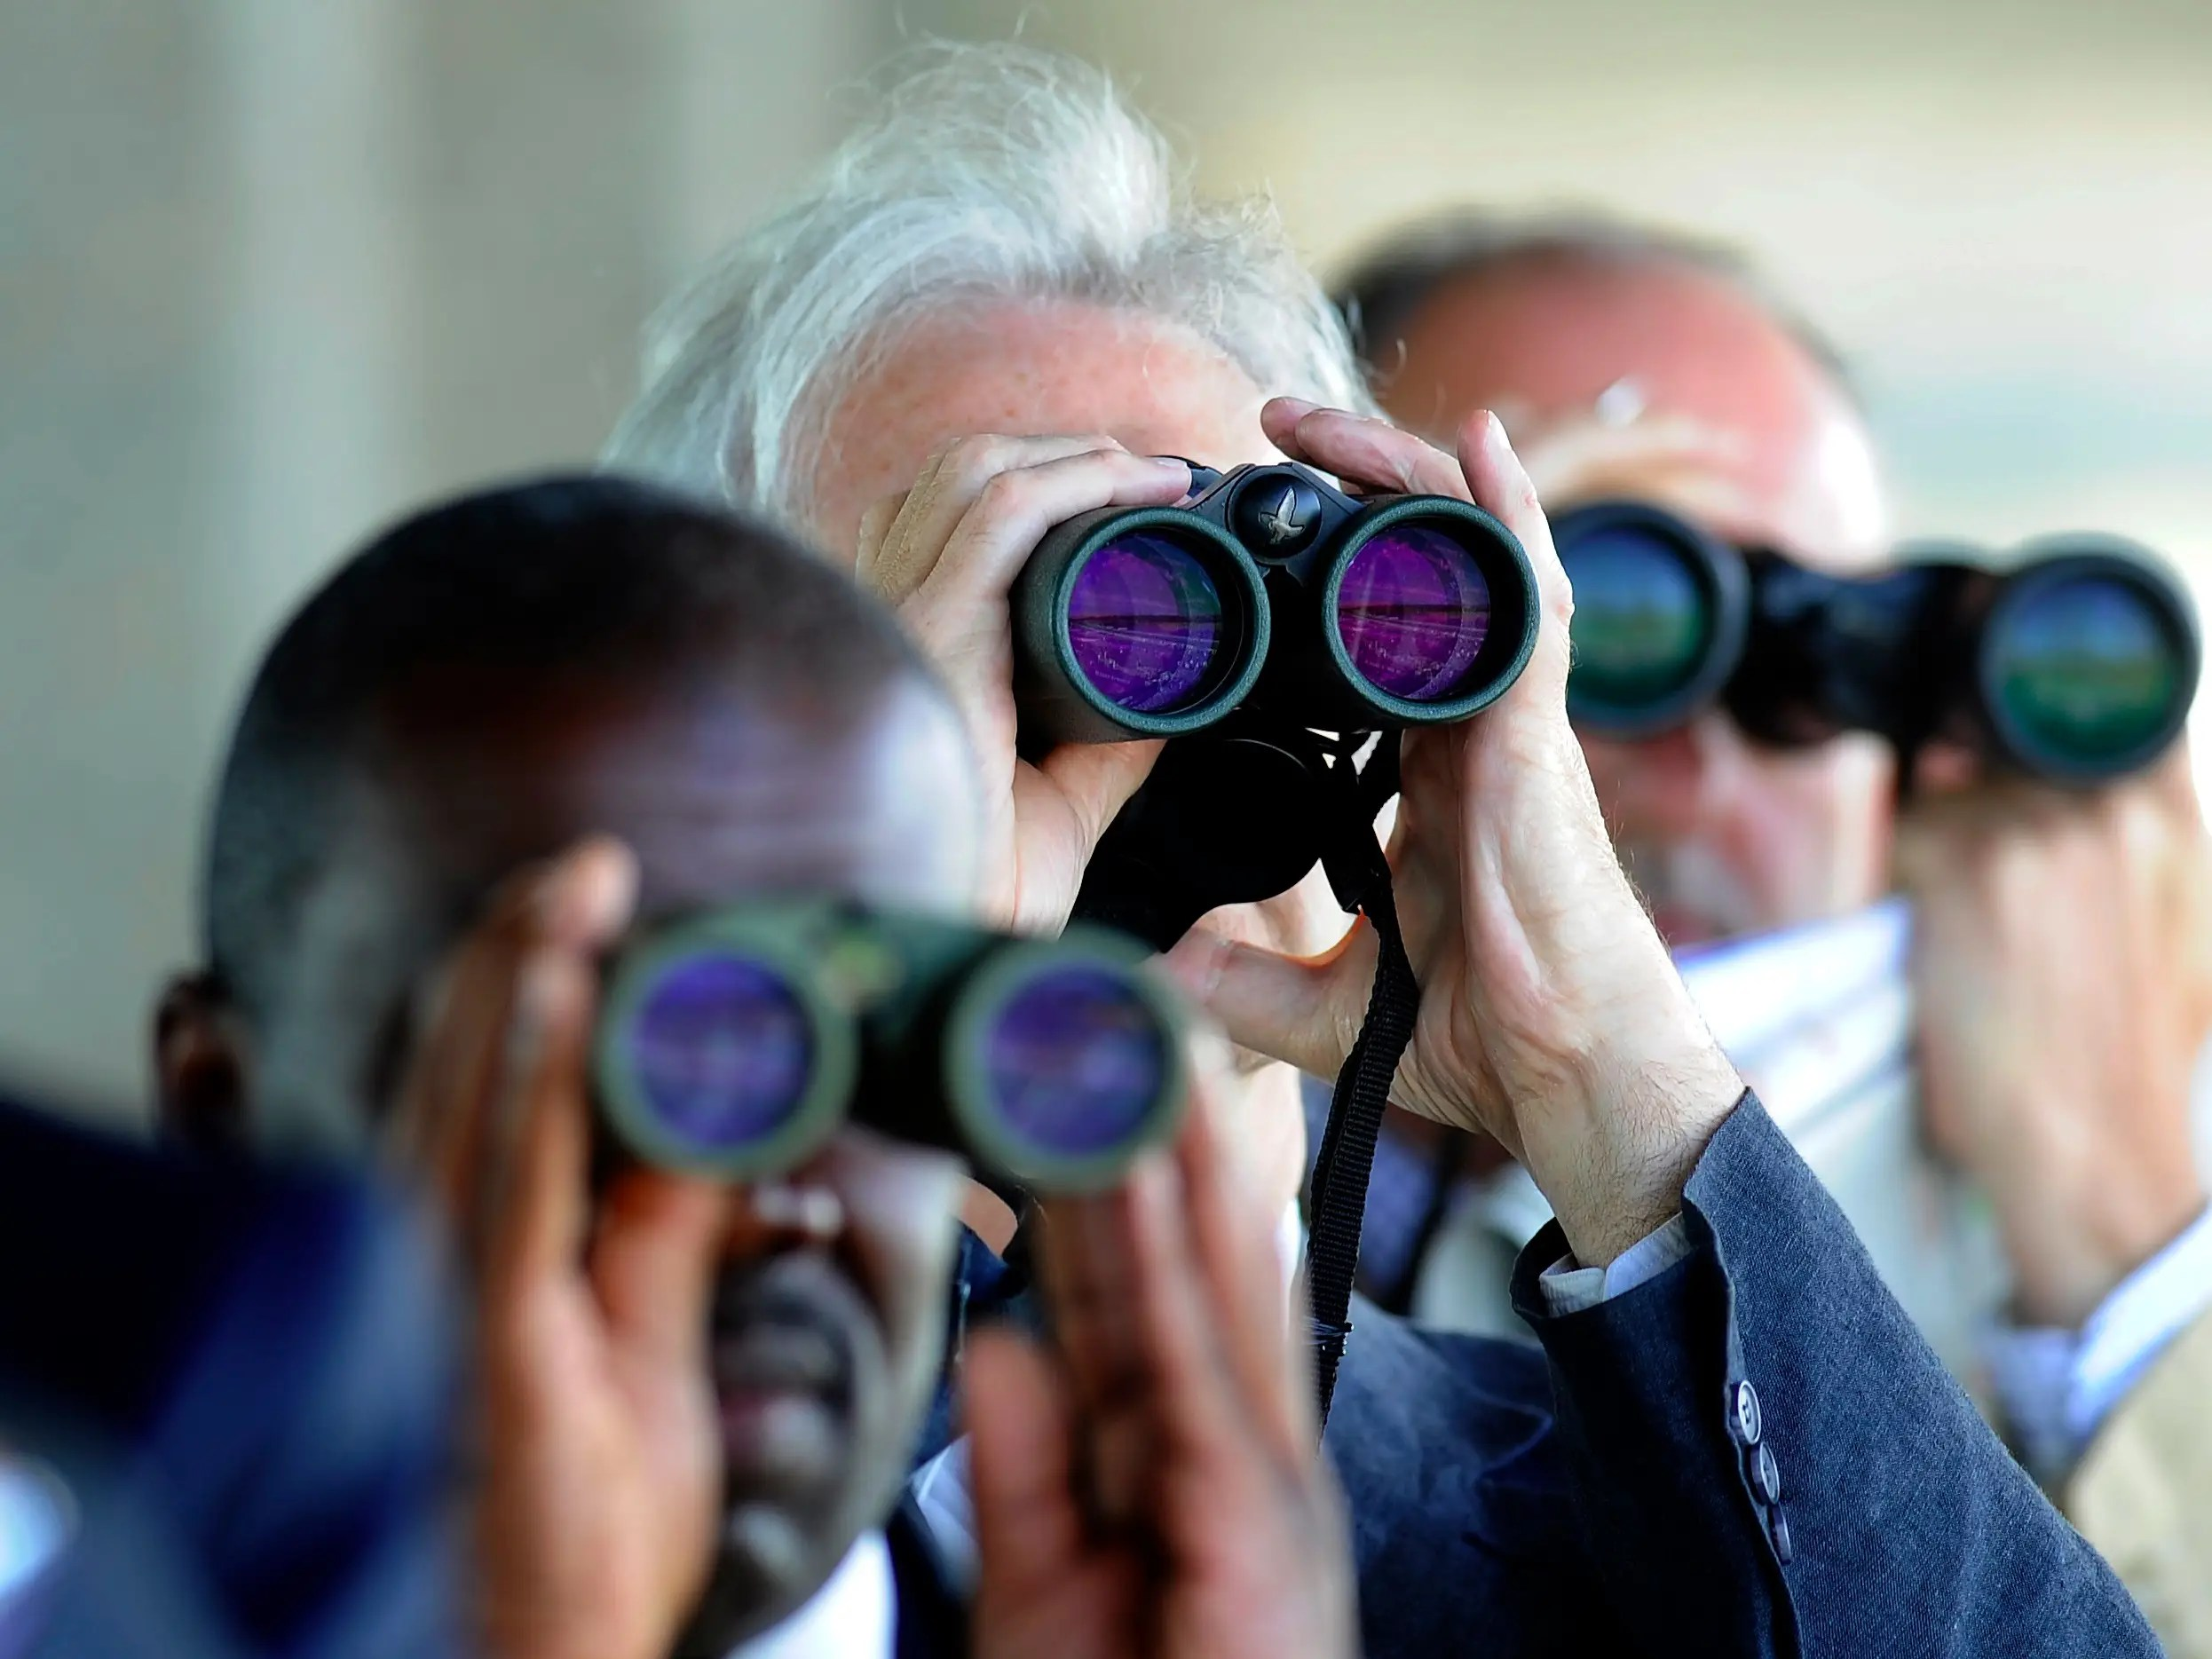 binoculars races men watching spying